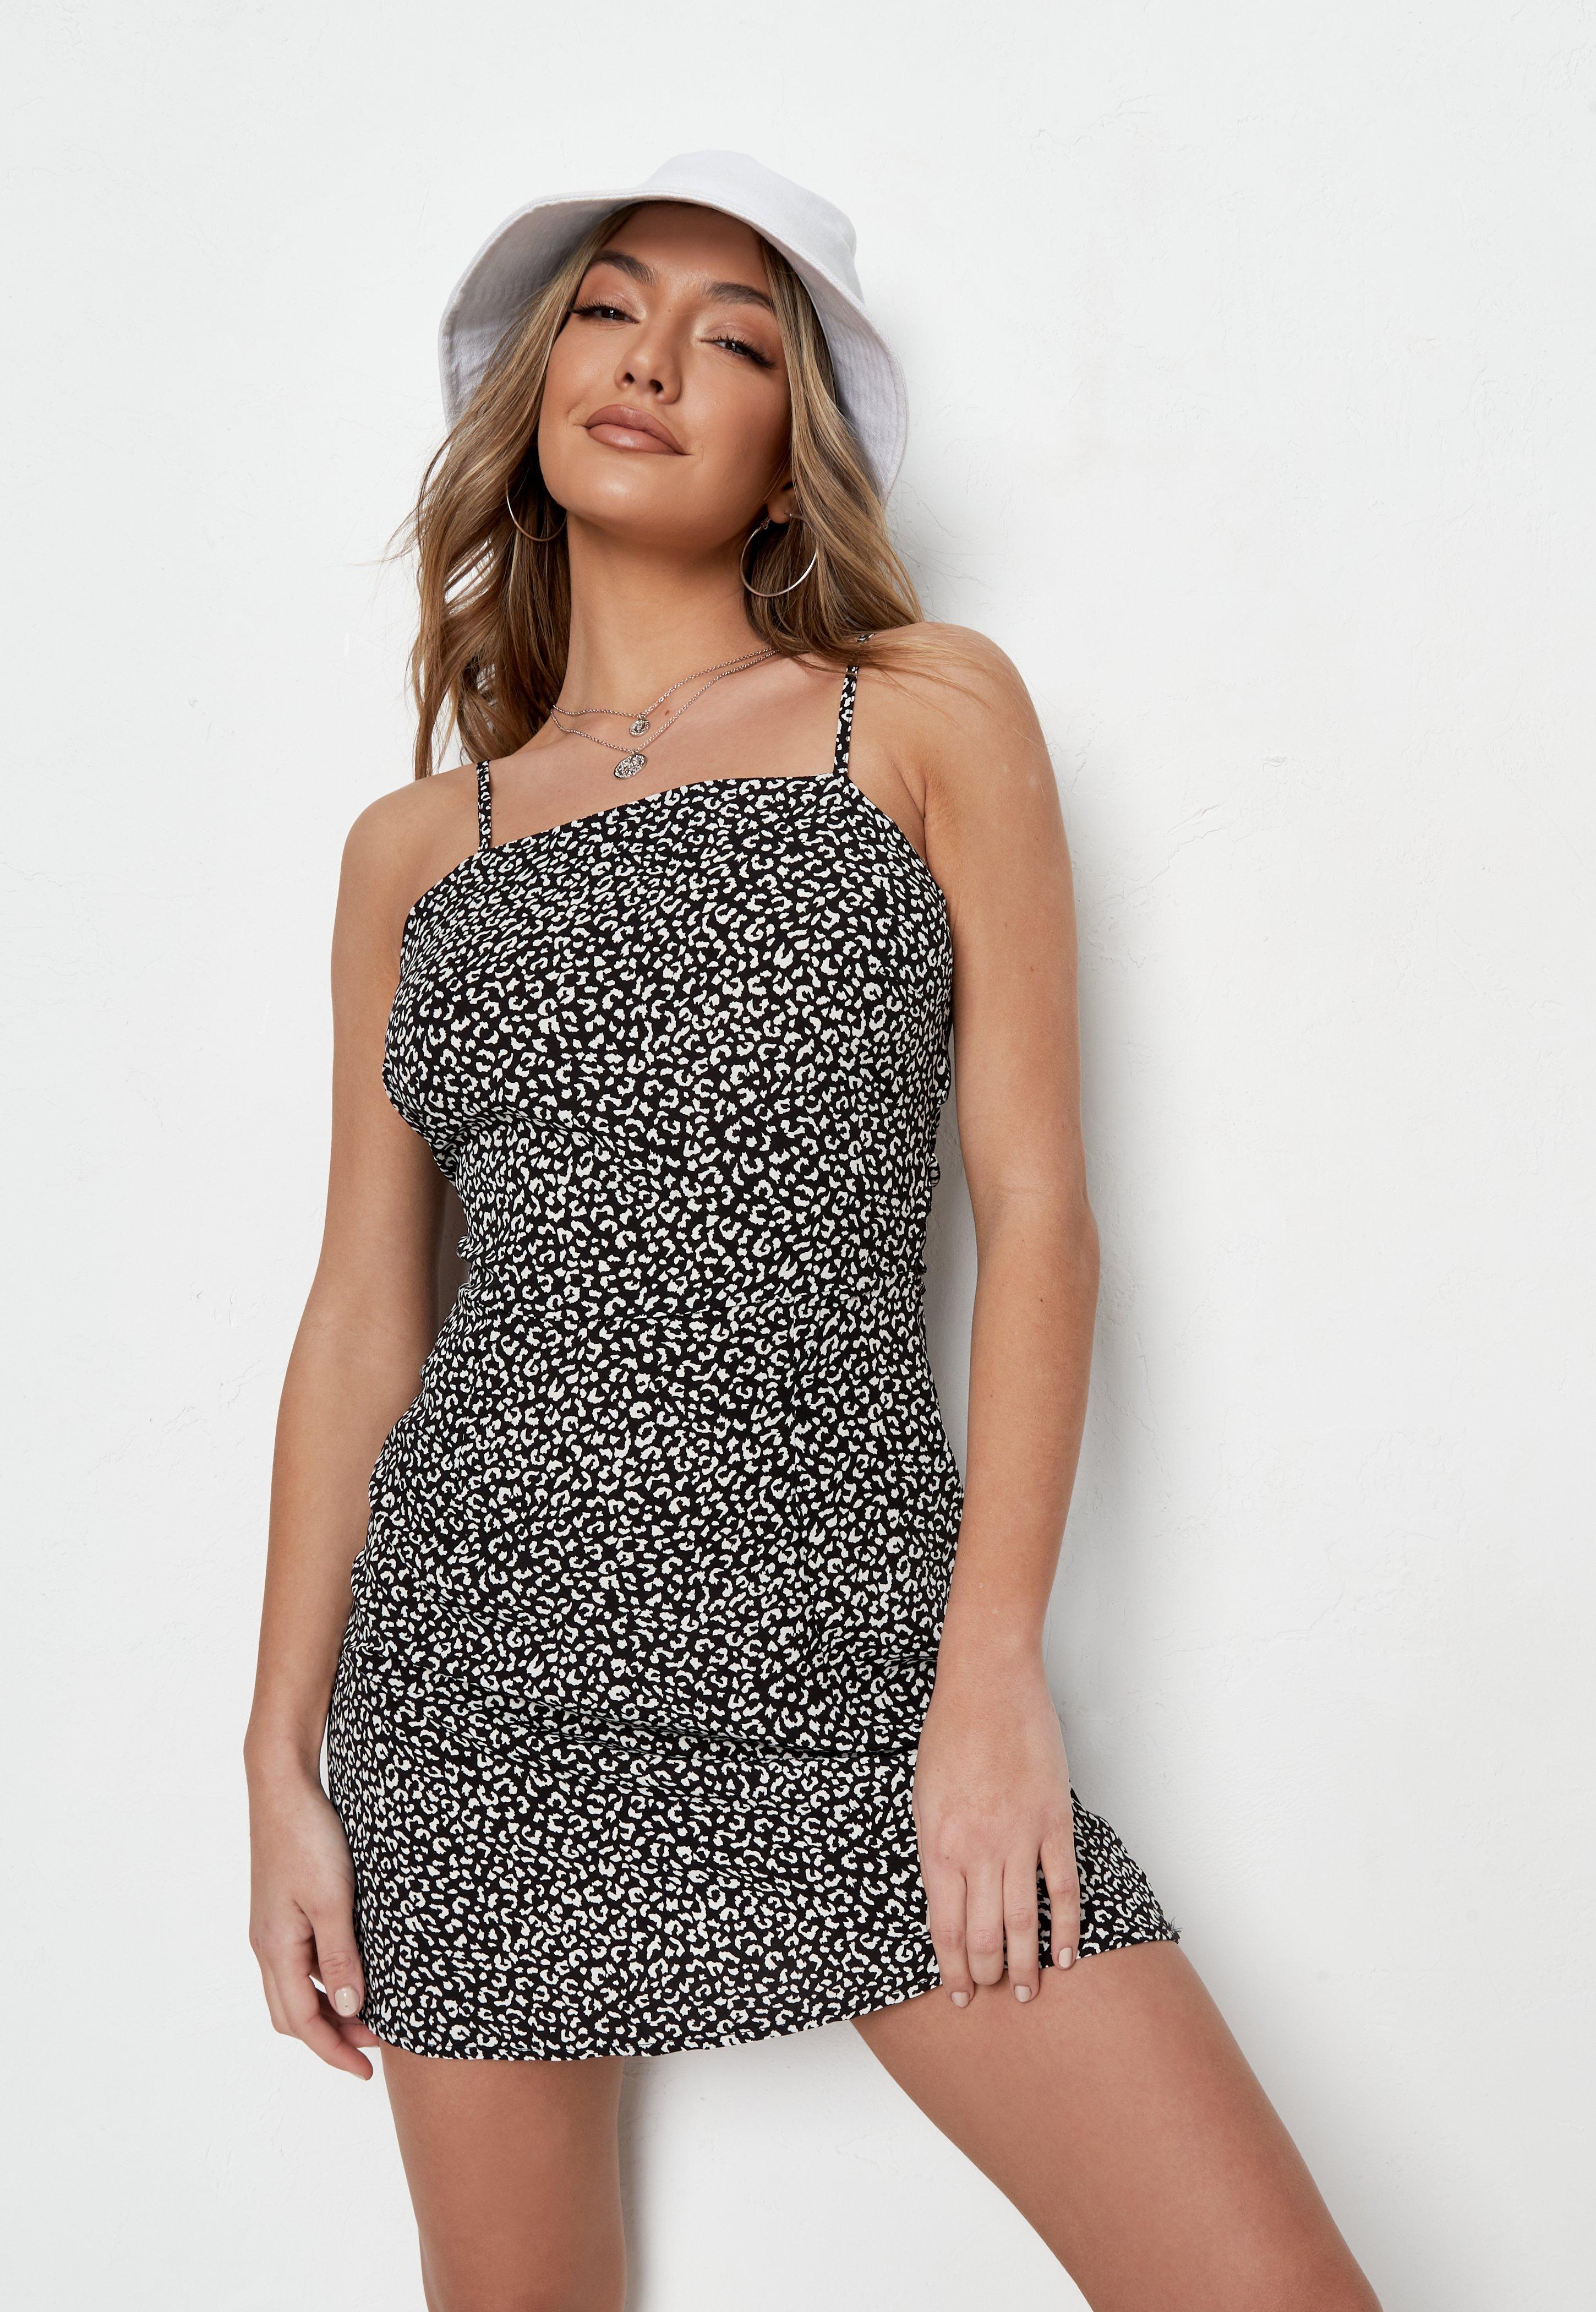 new high hot sale online new styles Leopard Print | Leopard Print Dress & Tops | Missguided